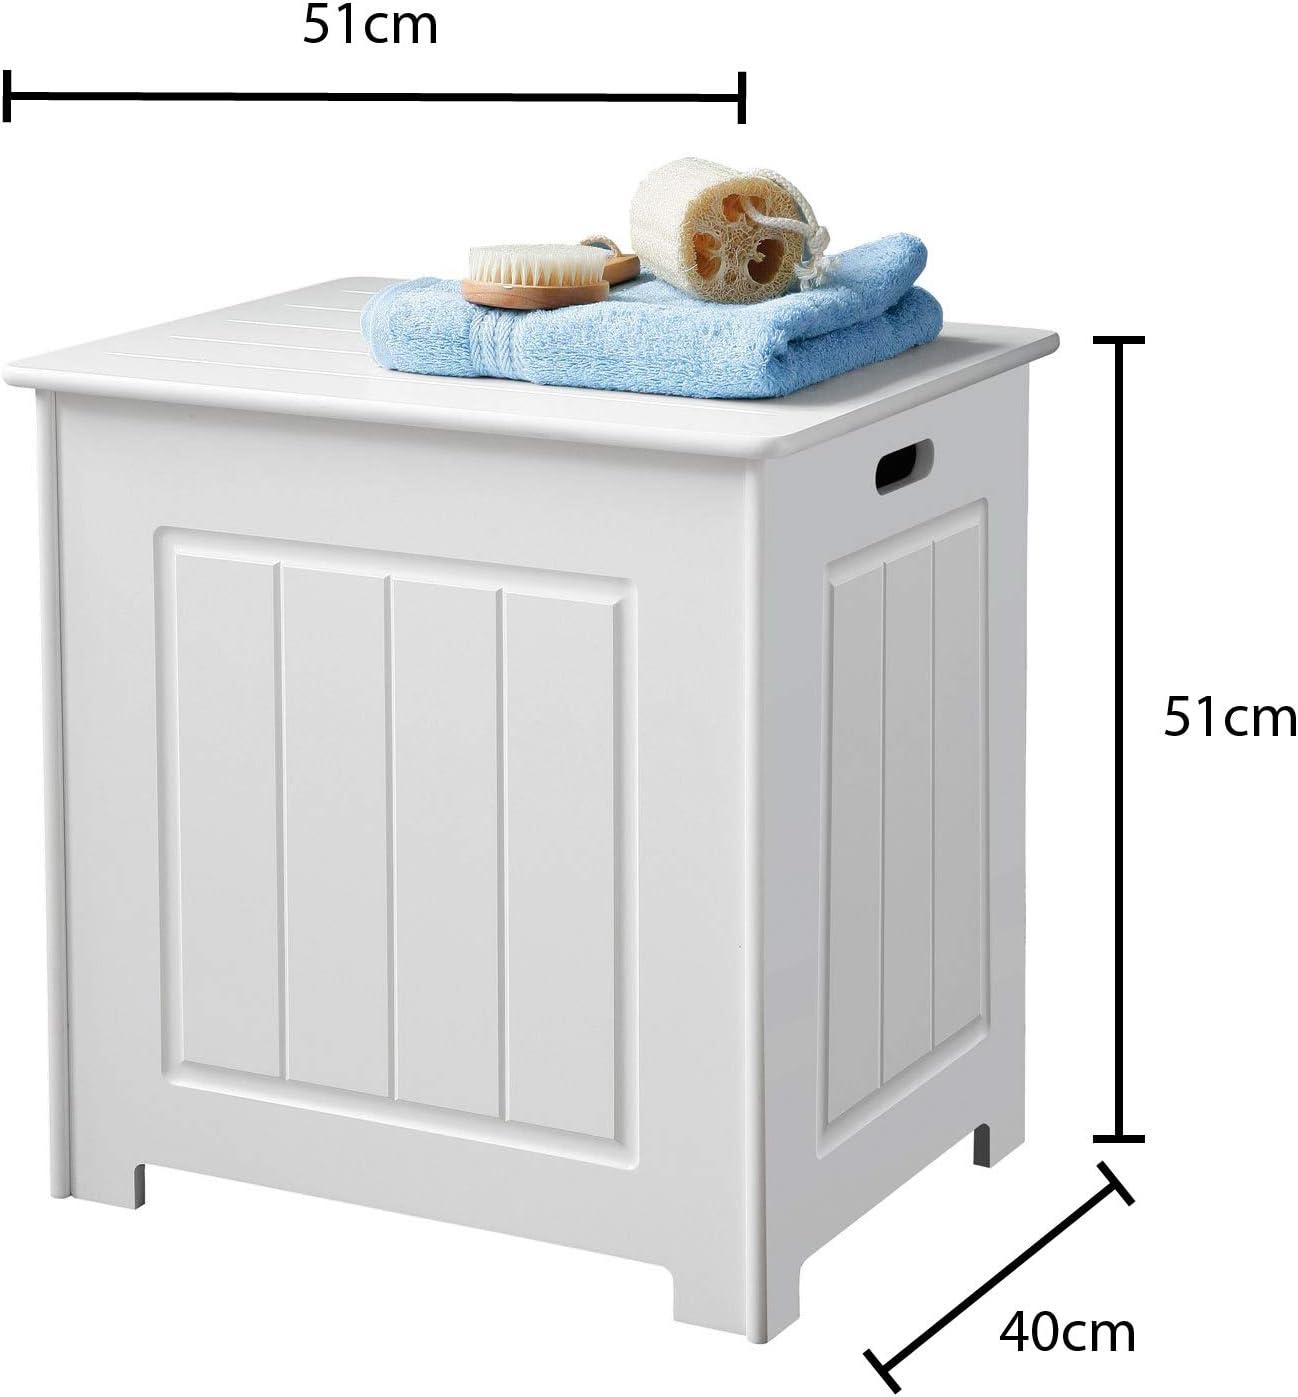 Large white laundry storage hamper basket bathroom bedroom accessory decor gift